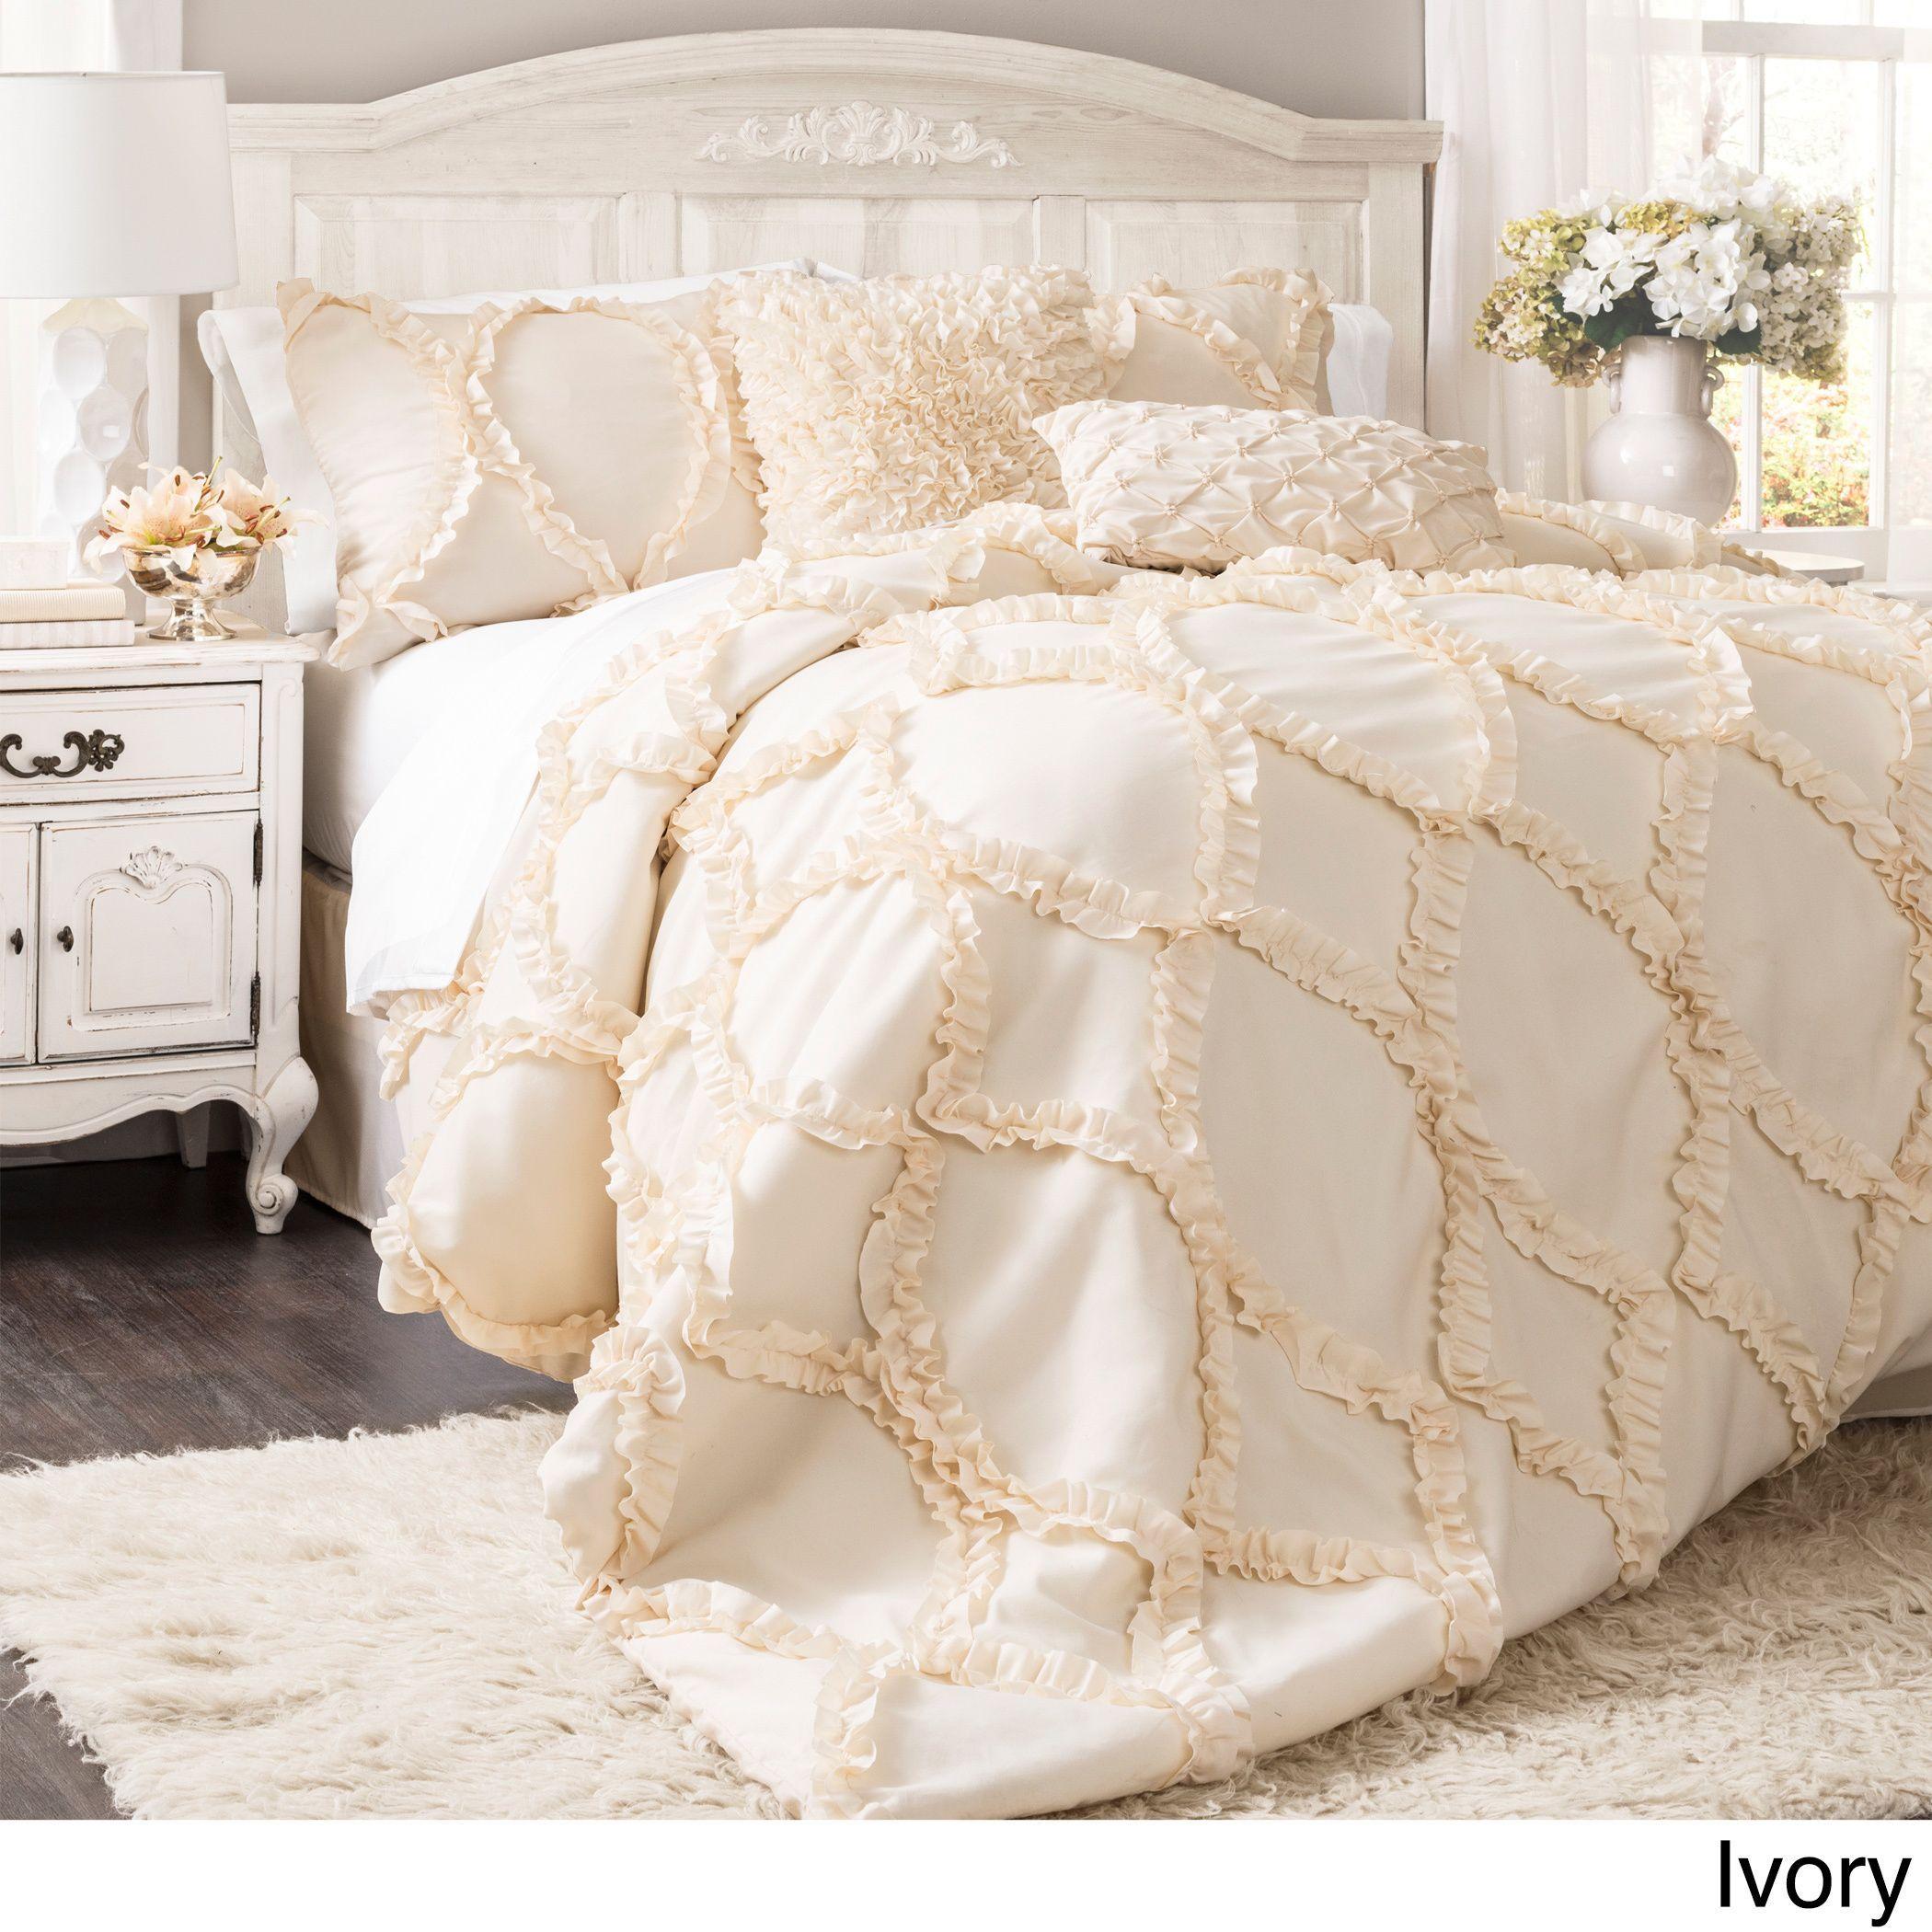 by bedding light comforter pin jennifer overstock pinterest set com rouge piece christine maison best textured ruffled sparks shopping sets on the white deals beddin